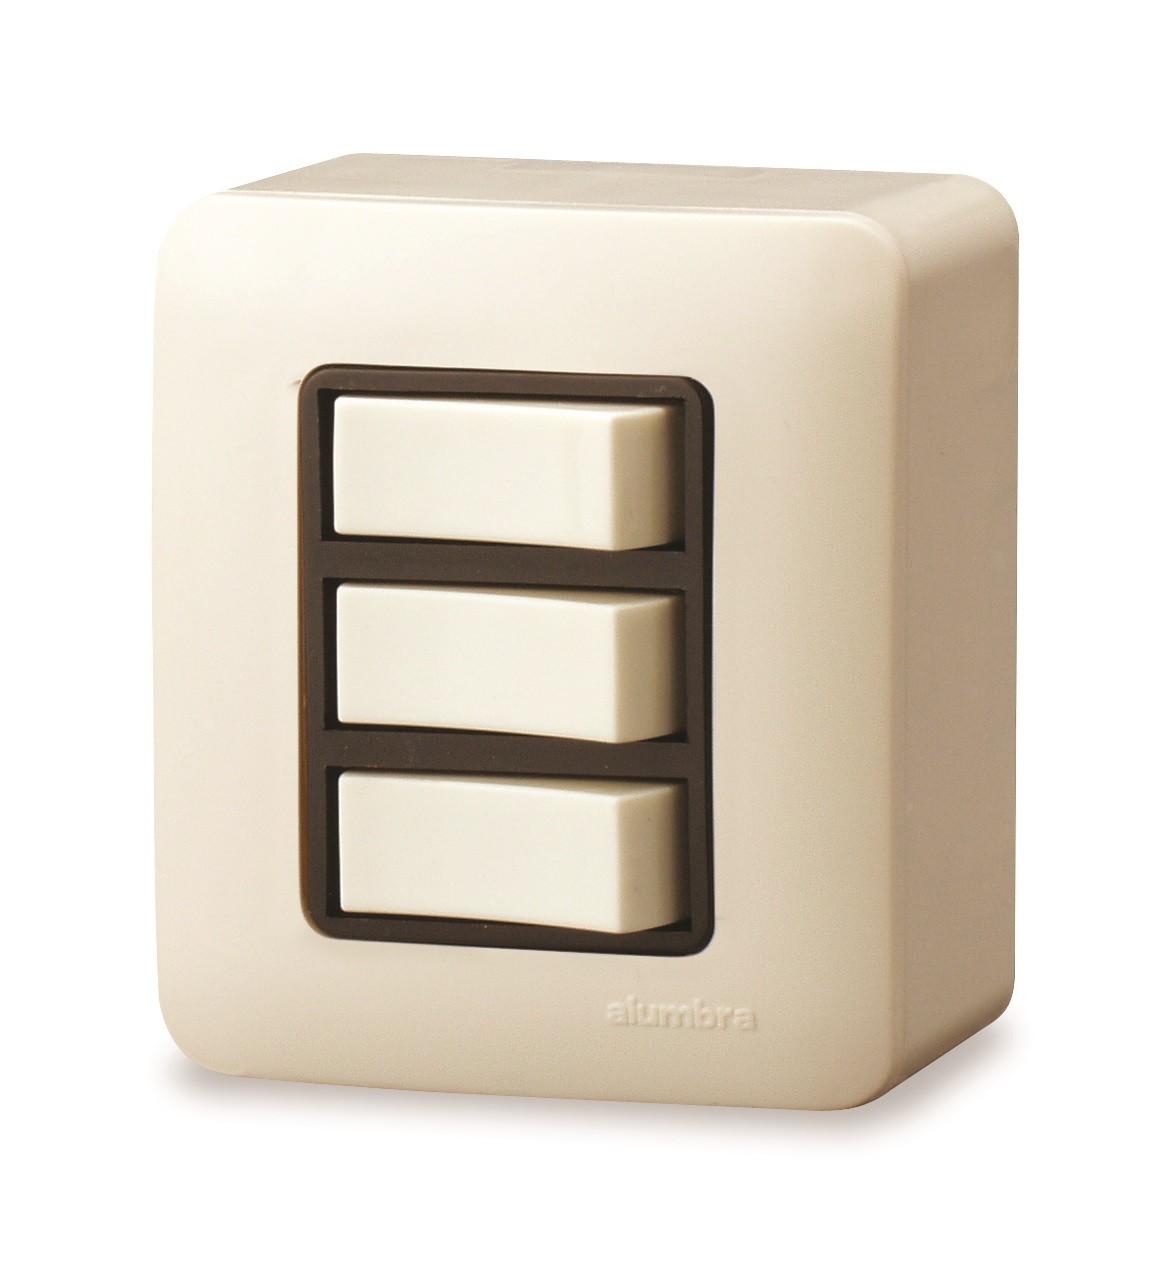 Conjunto De Sobrepor 2 Interruptores Paralelo  Elos +1 Interruptor Simples 10A Com  Placa - Branco - Alumbra - Linha A